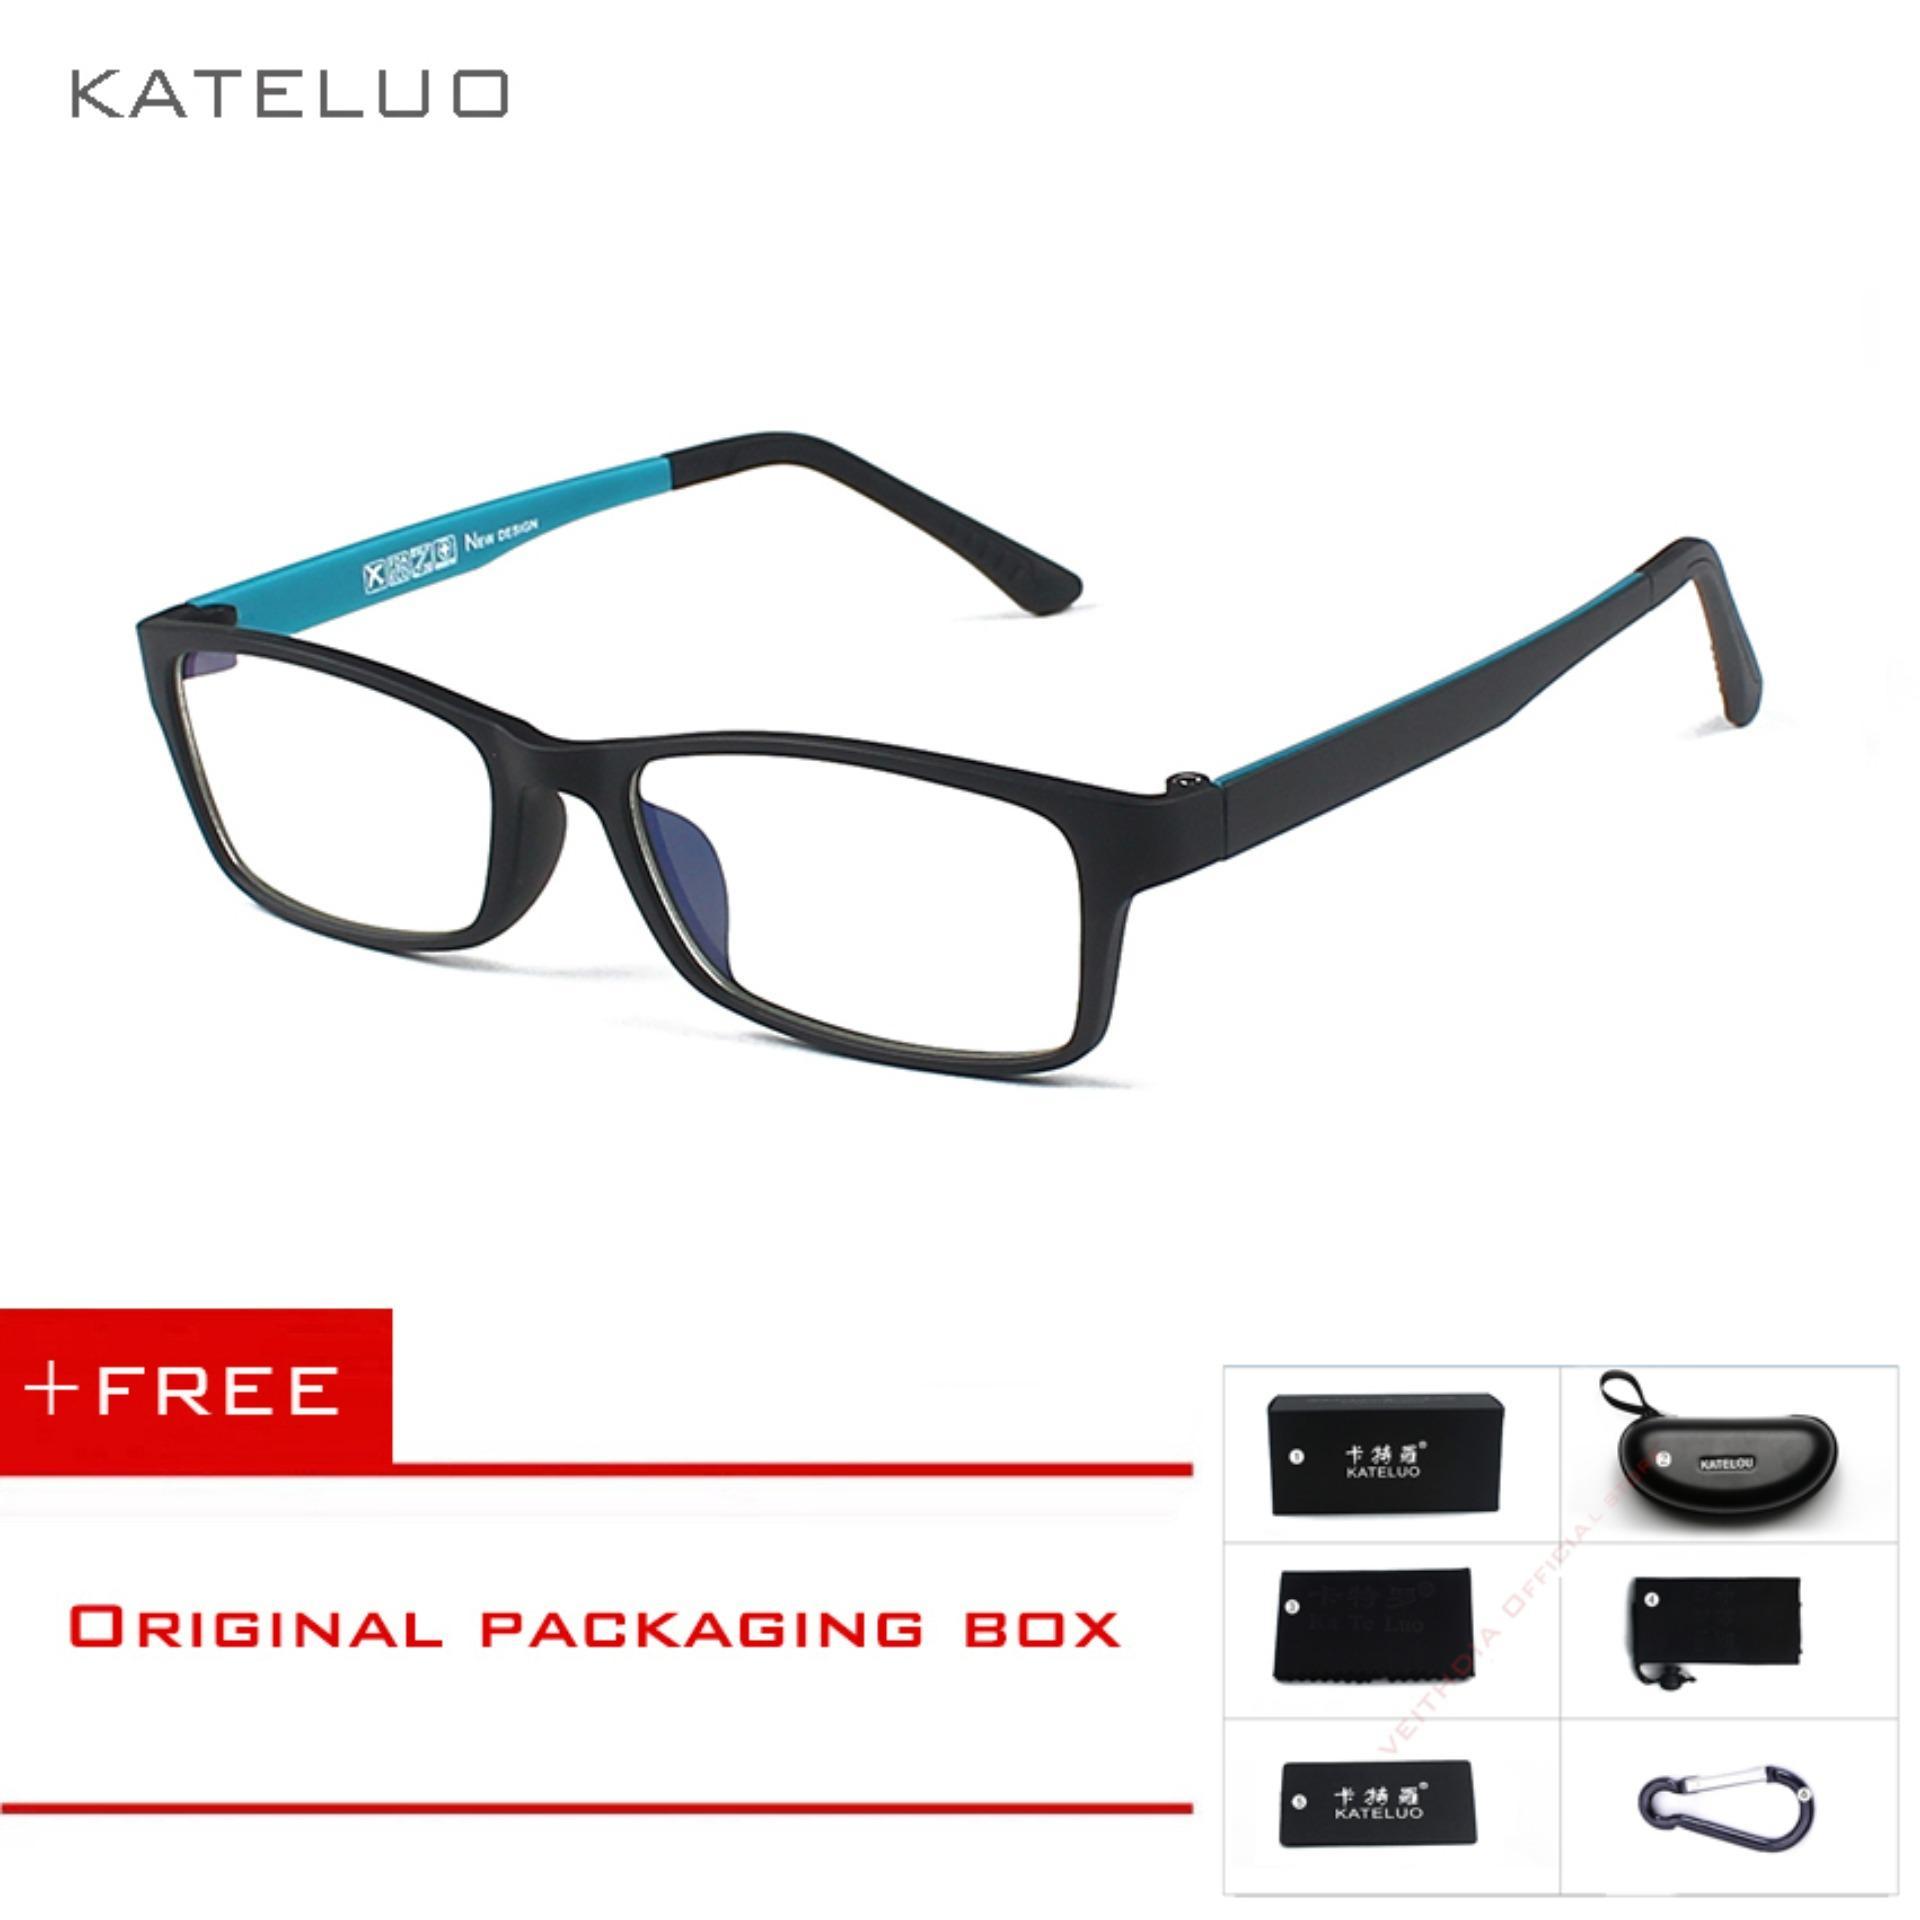 KATELUO Kacamata Radiasi Kacamat Komputer Anti Lelah Untuk Pria Wanita 1302